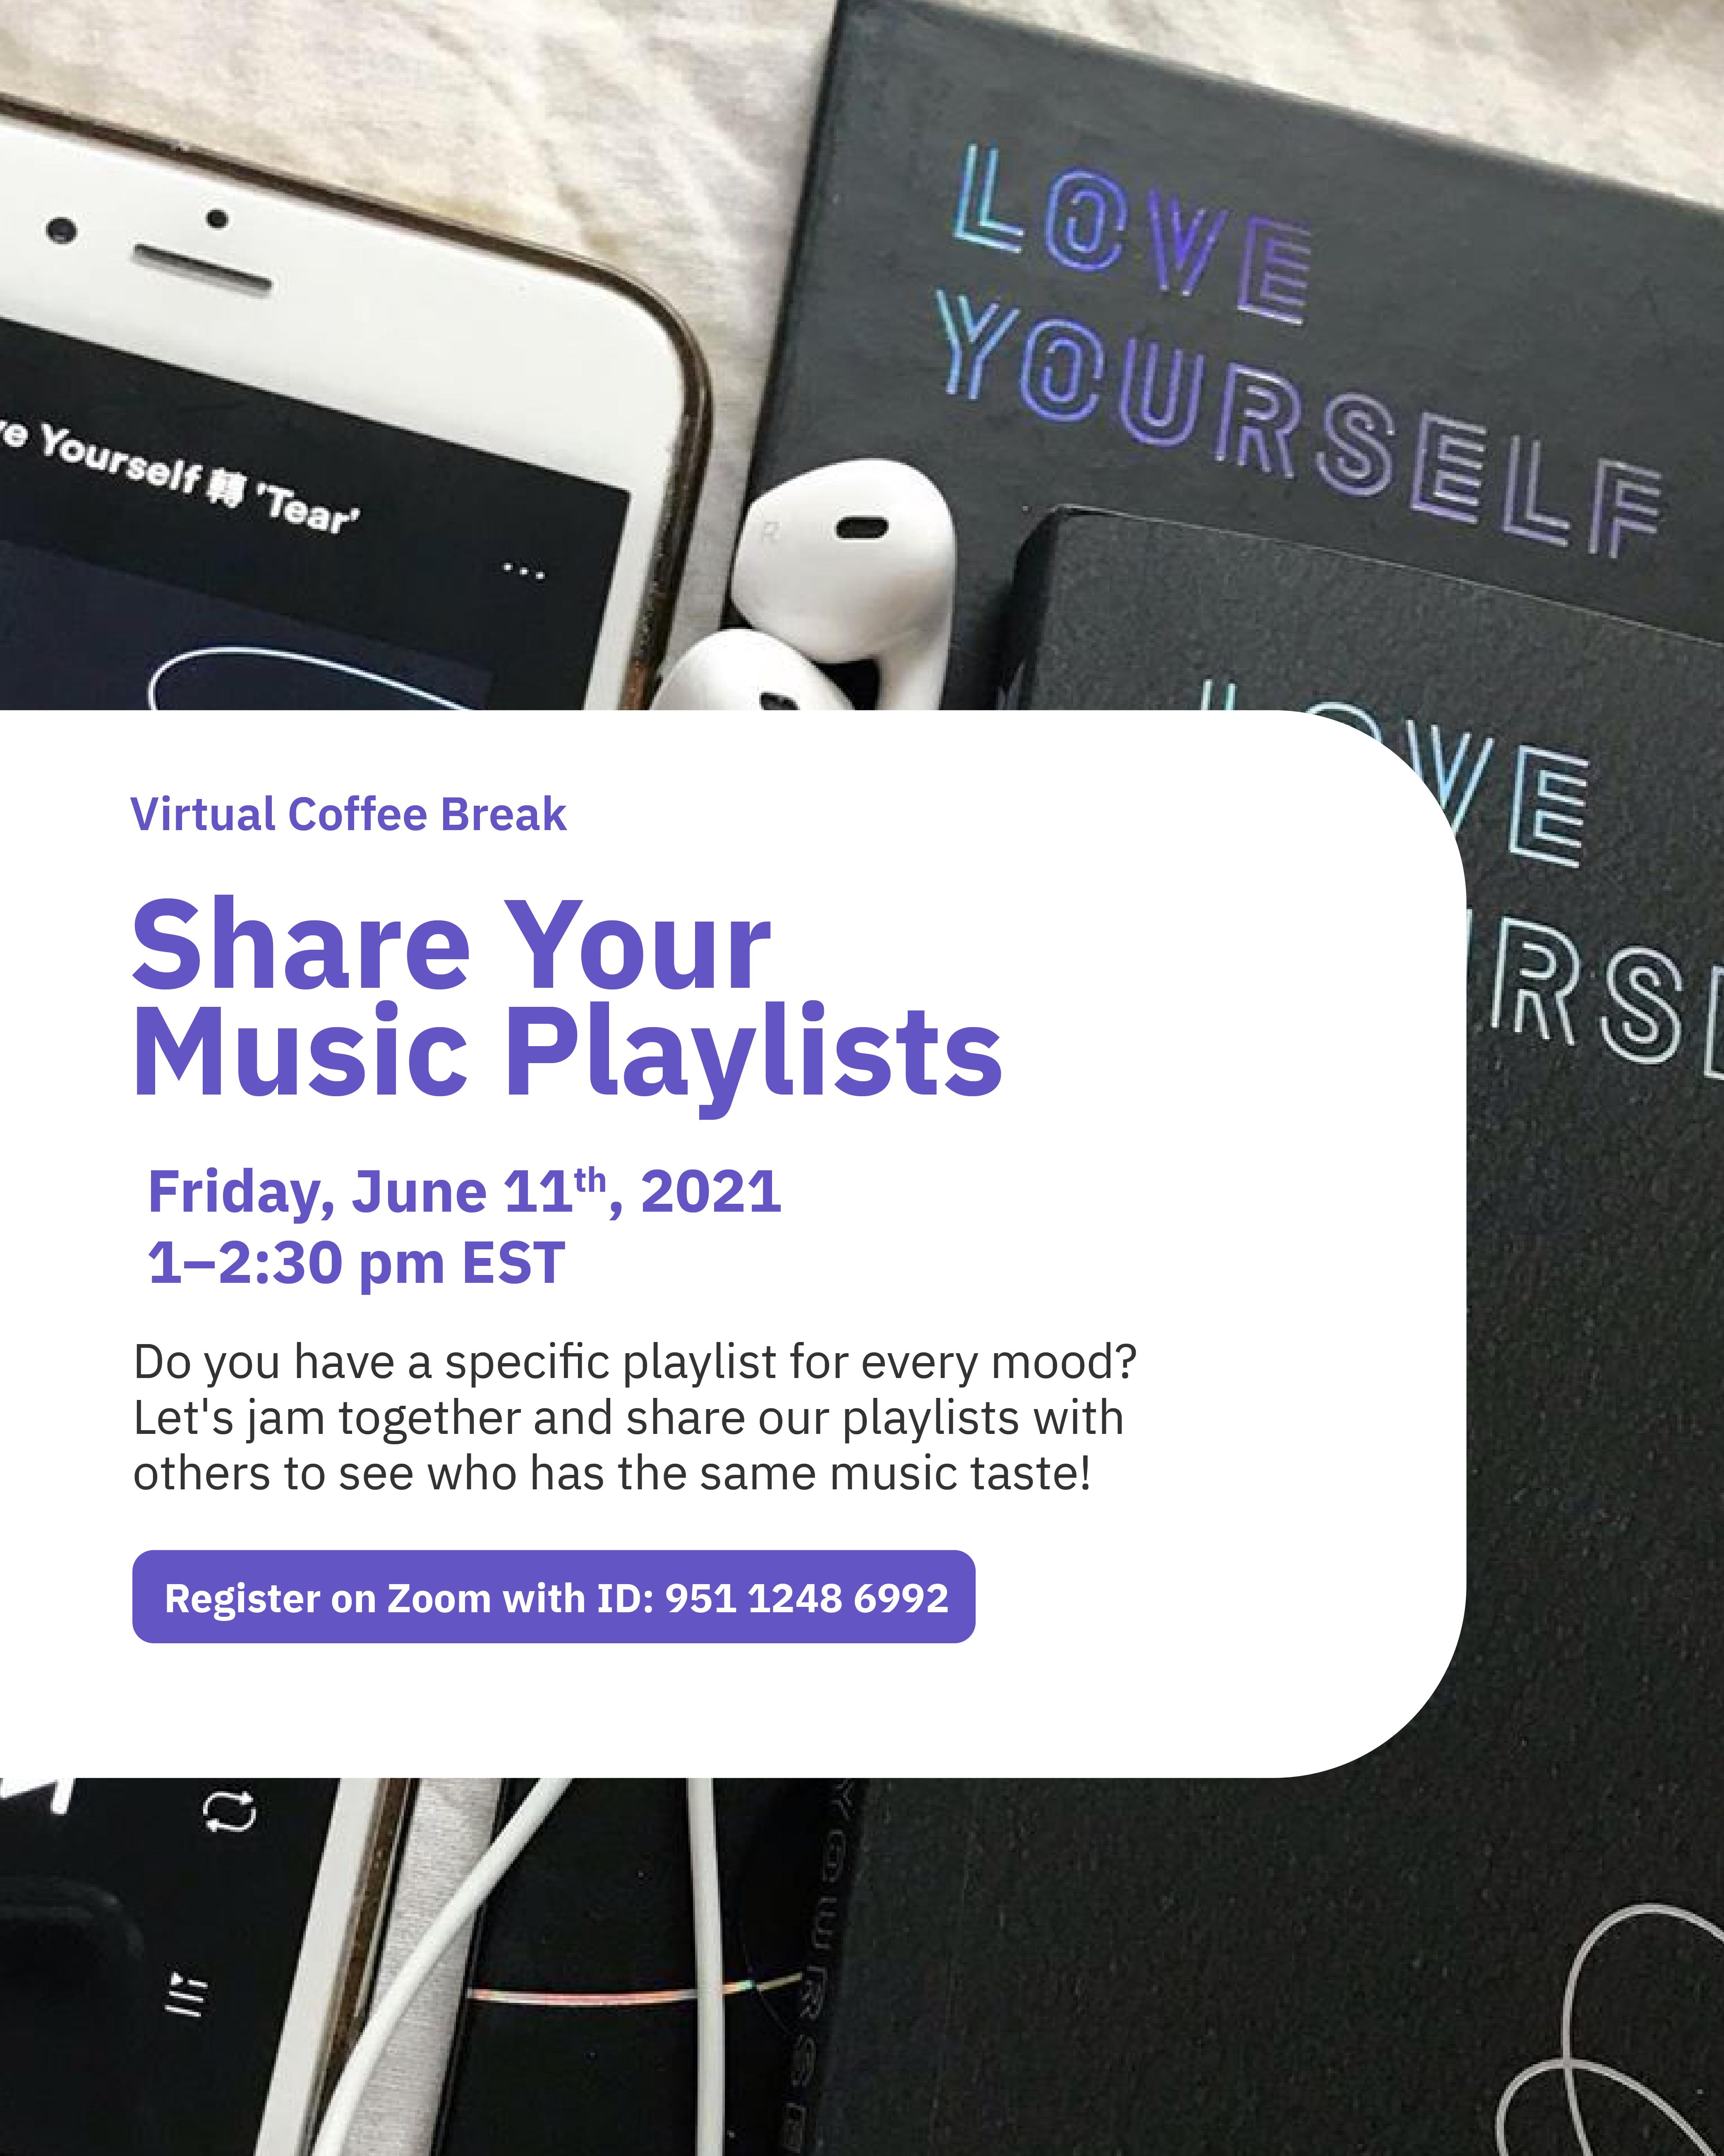 Virtual Coffee Break: Share Your Music Playlist @ Zoom - York International